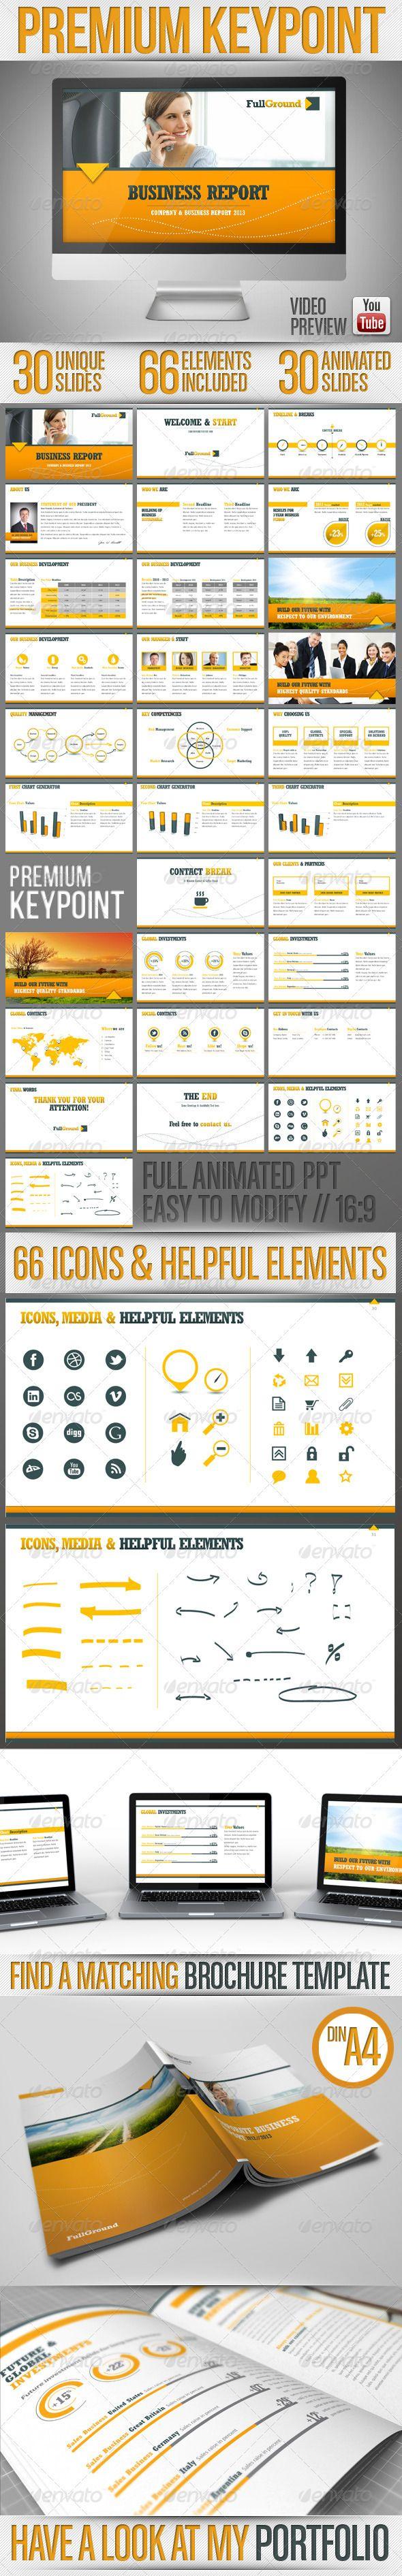 Fullground - Keynote Presentation Template